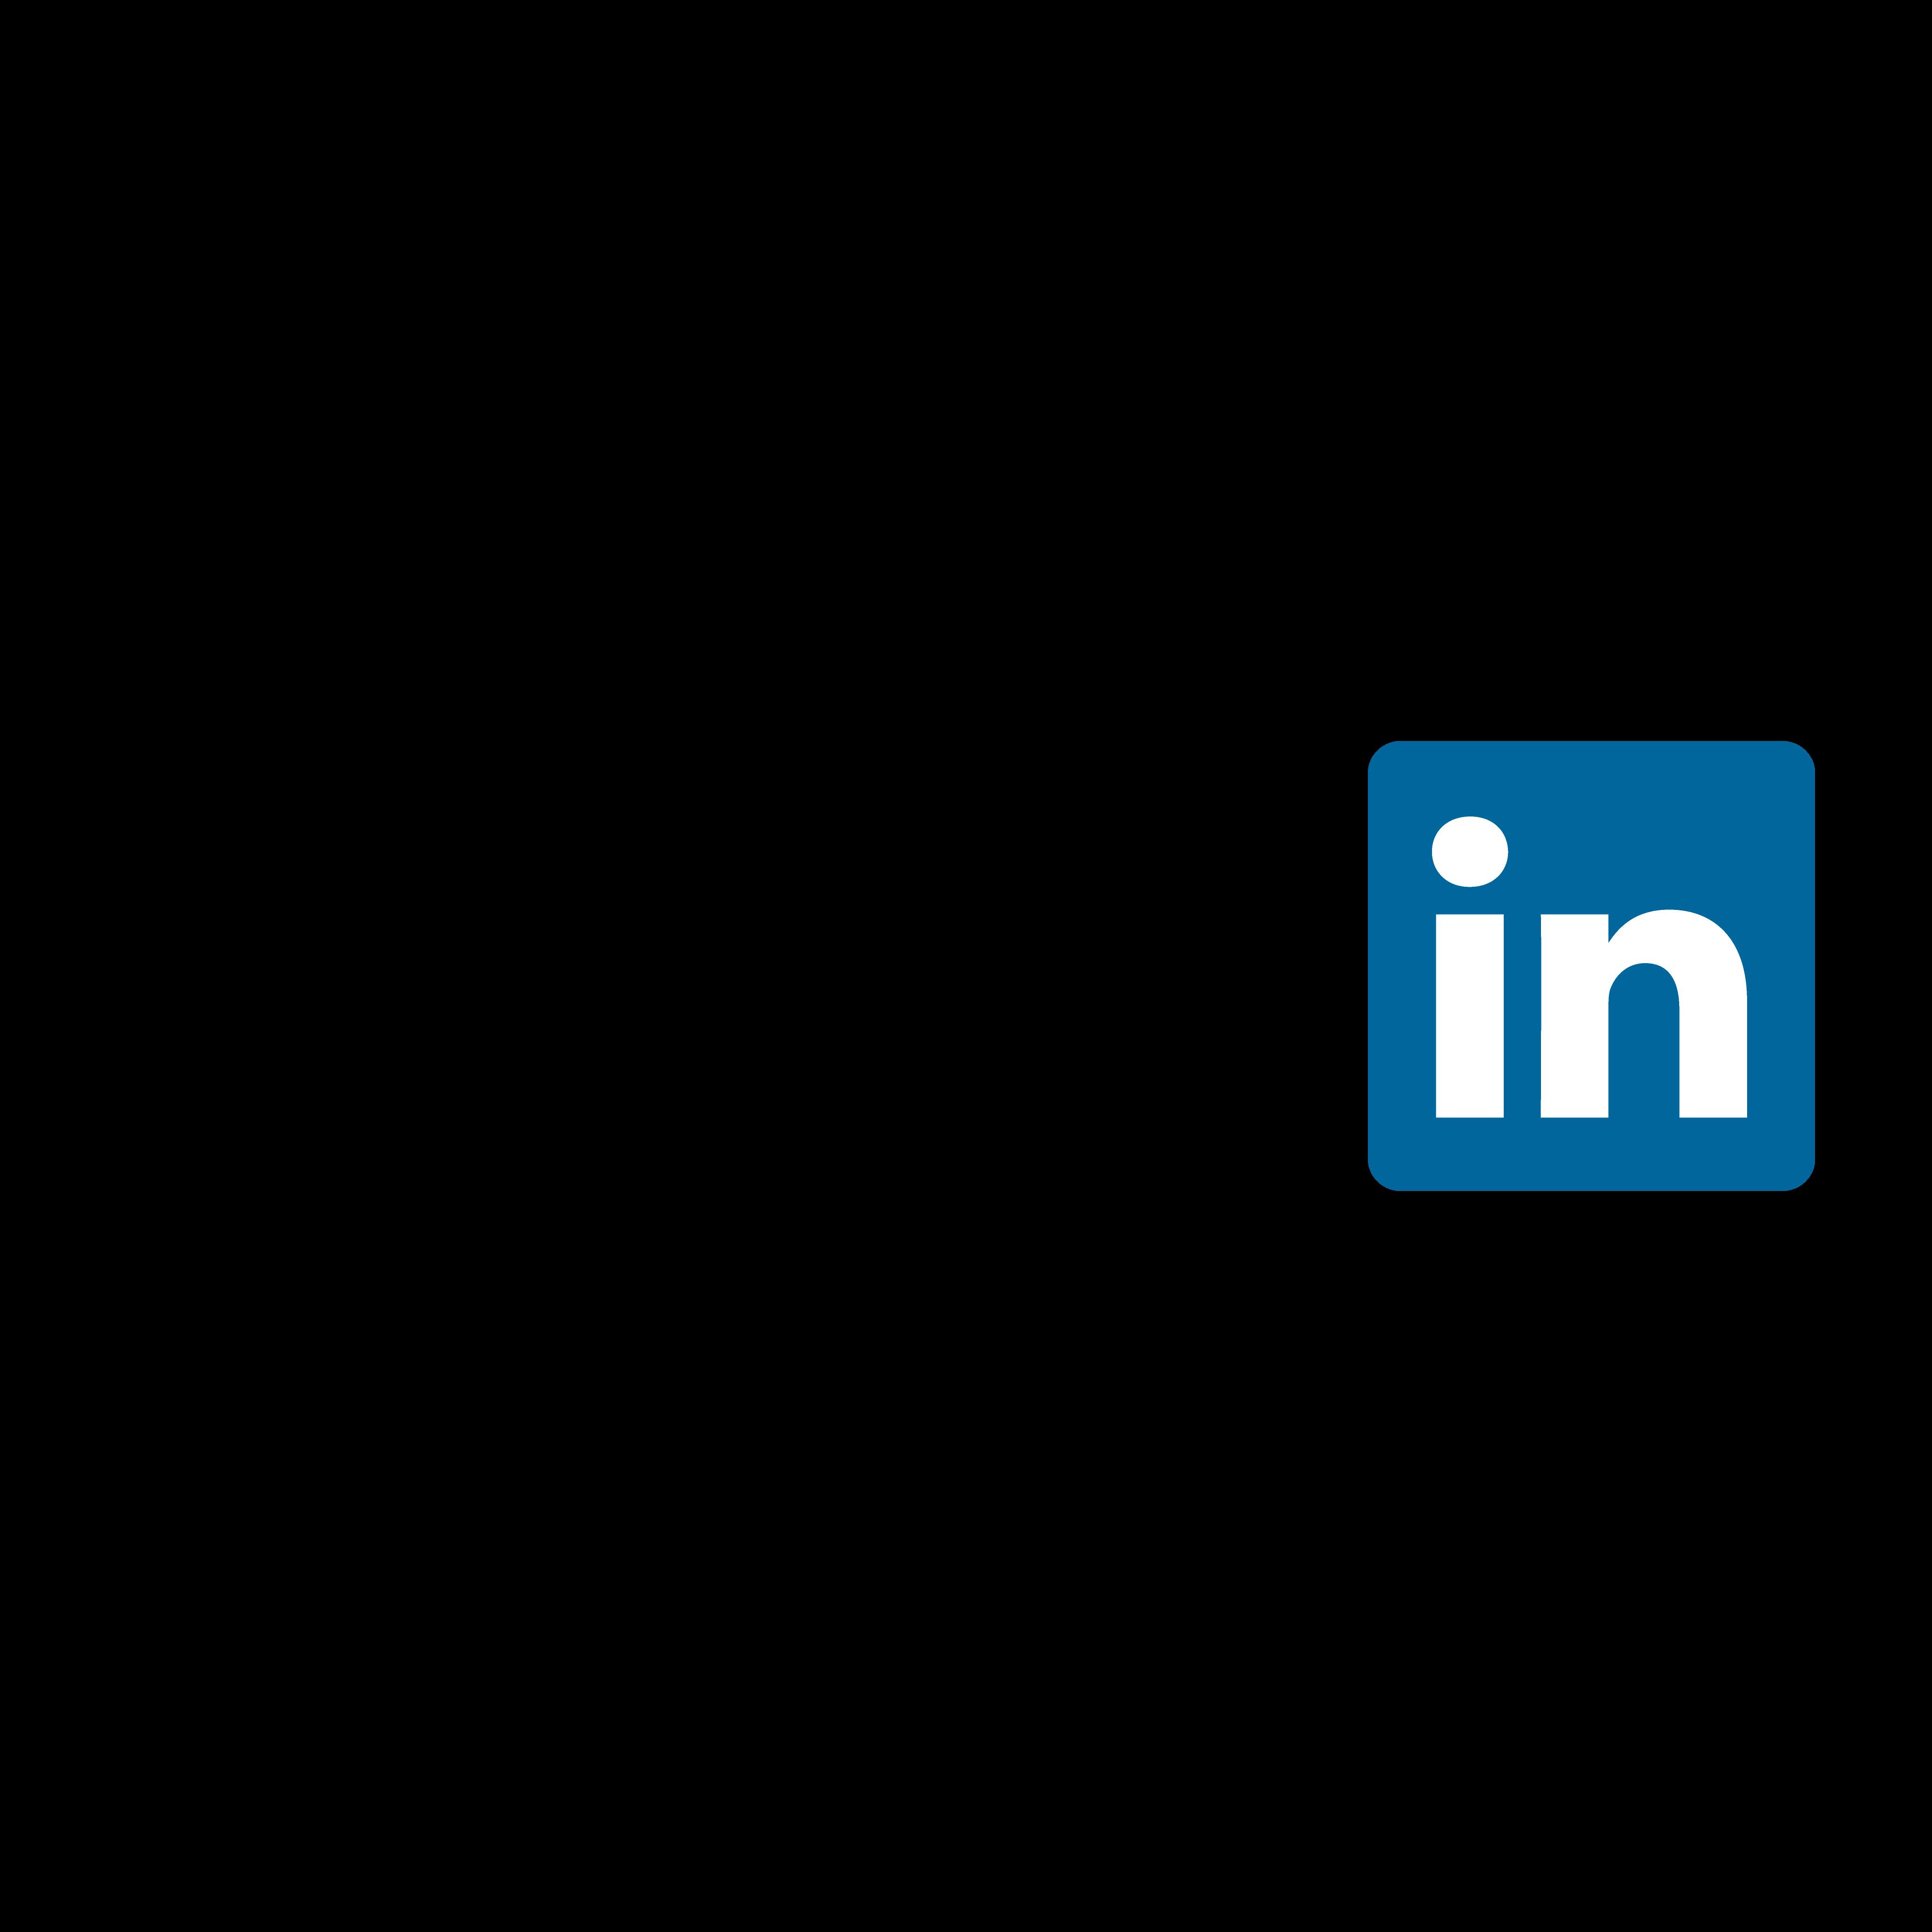 Logo LinkedIn - Logos PNG